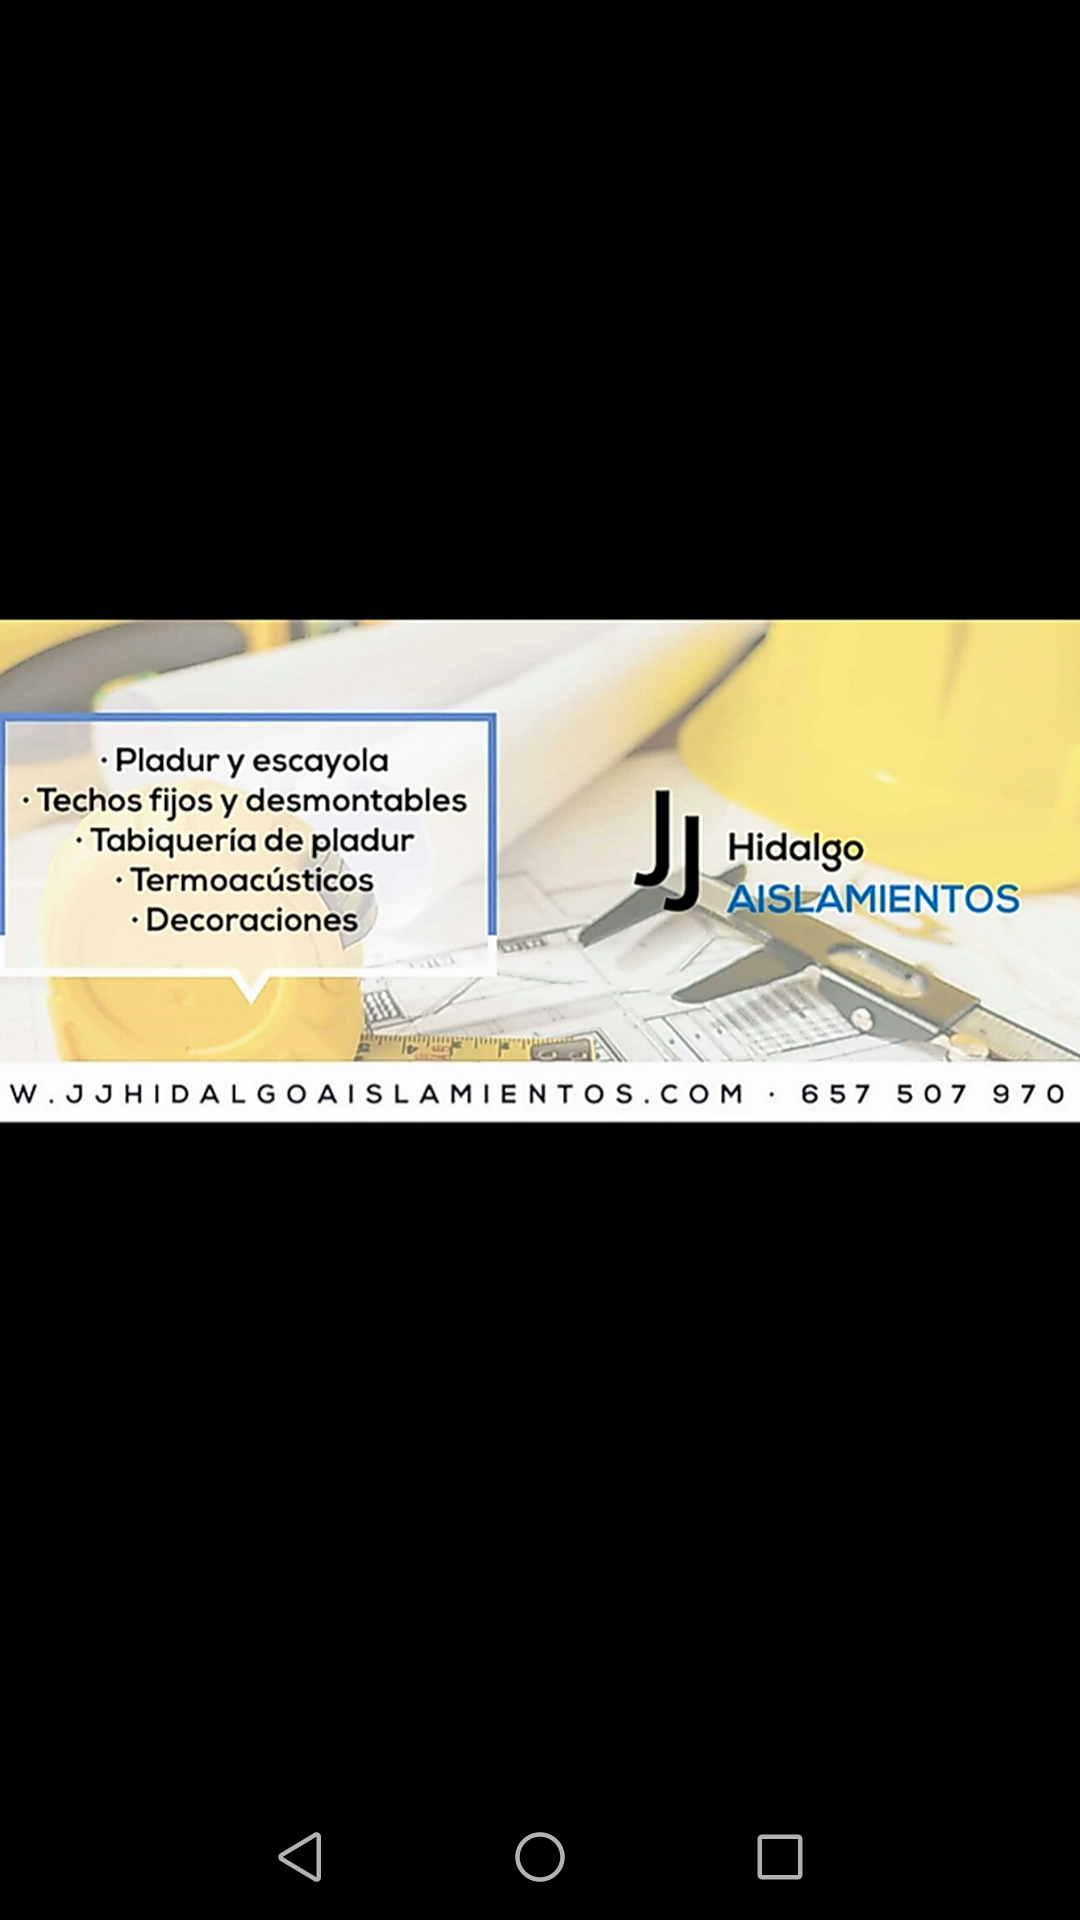 J J Hildalgo Aislamientos